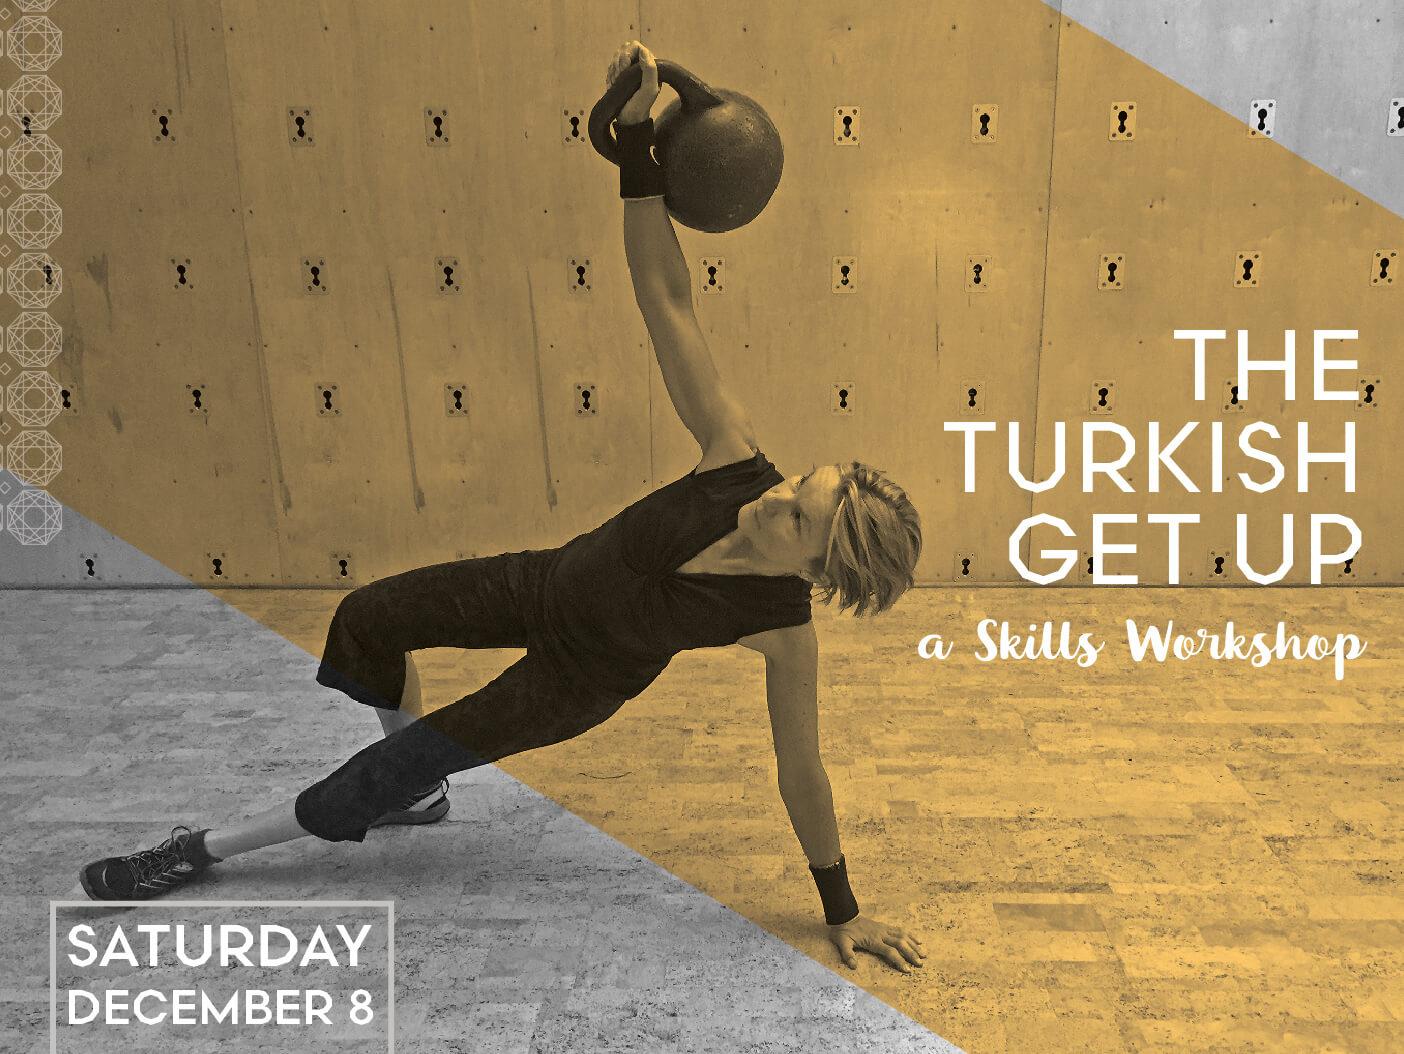 The Turkish Get Up: A Skills Workshop